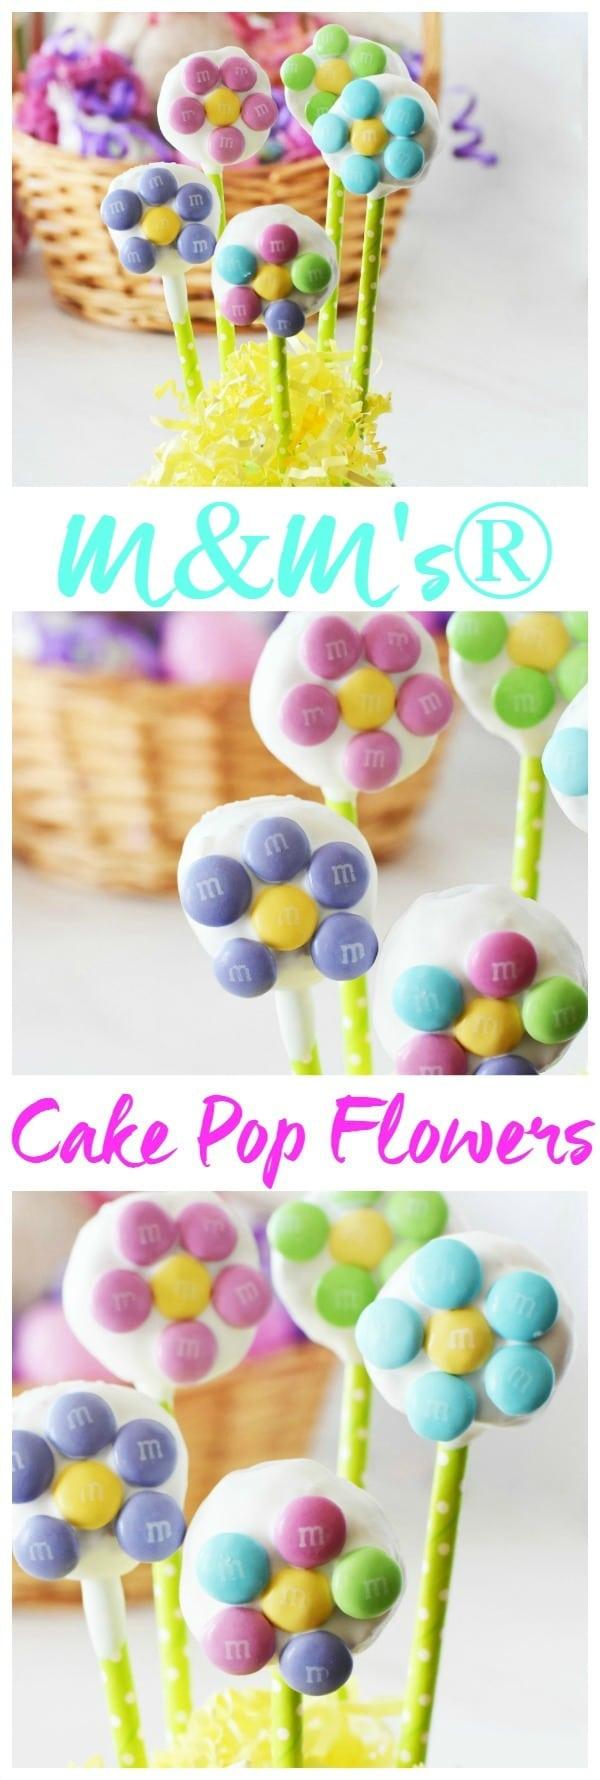 Cake Pop Flowers1